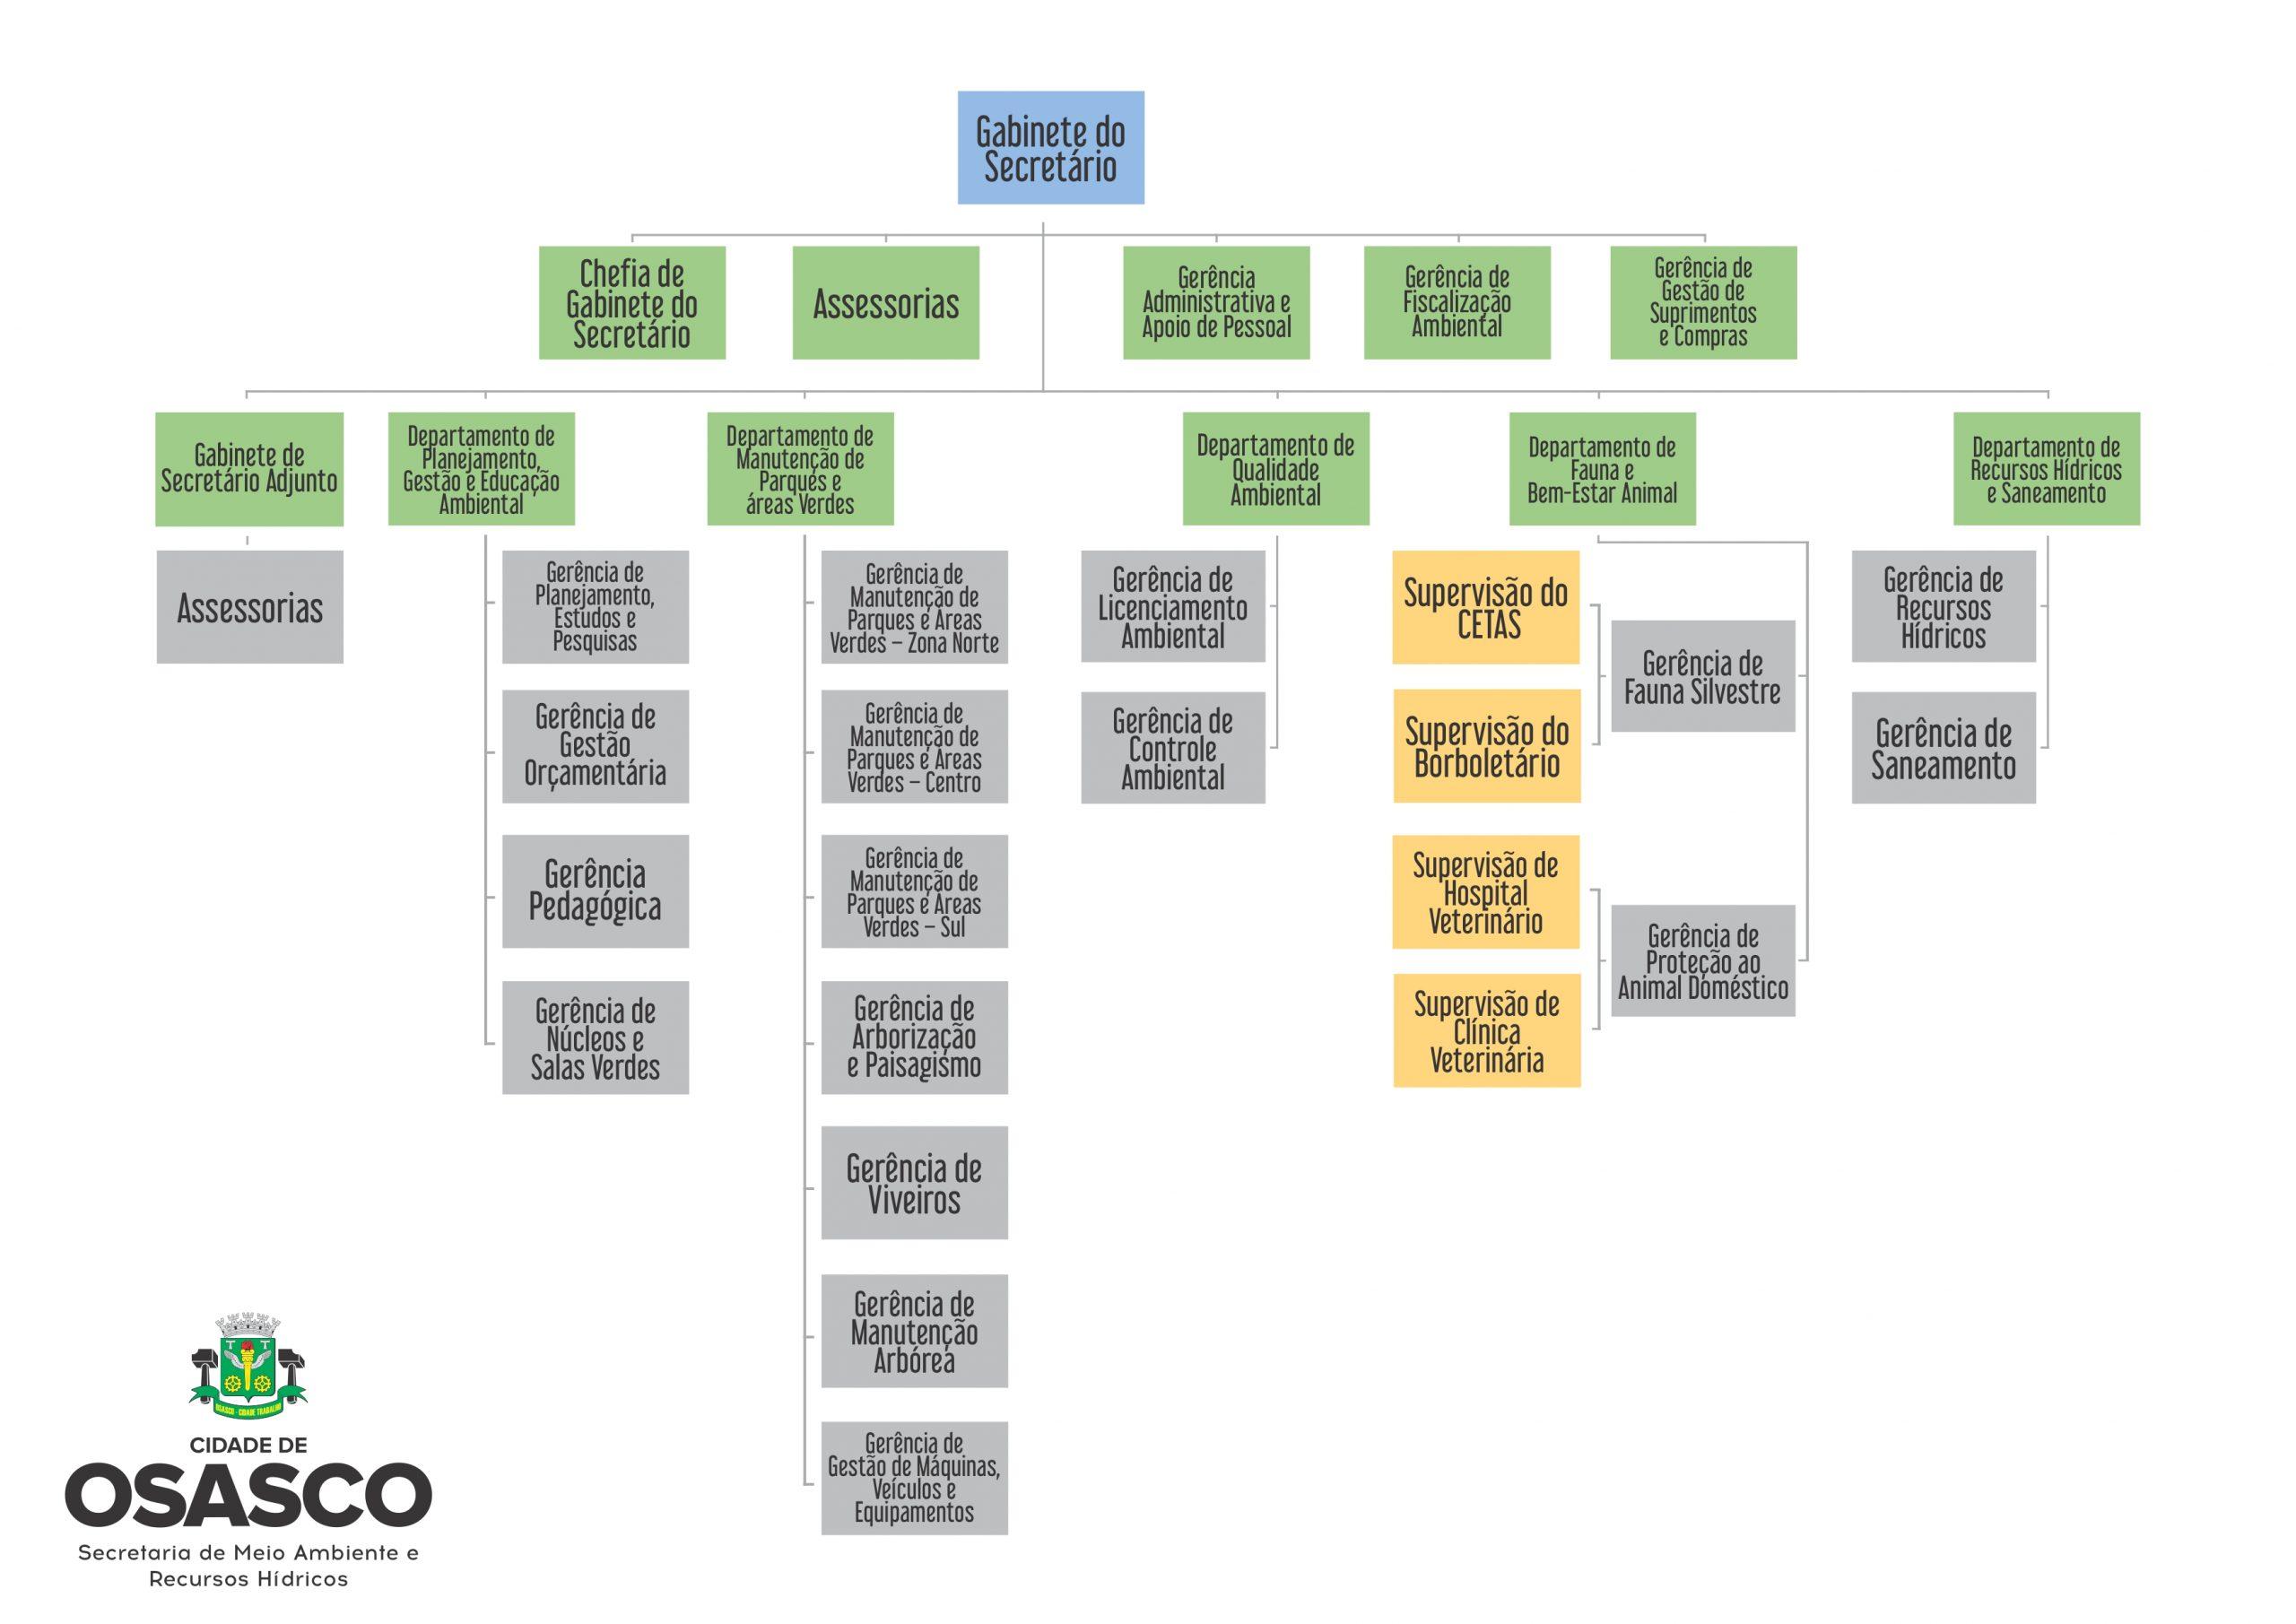 secretaria-de-meio-ambiente-e-recursos-hidricos